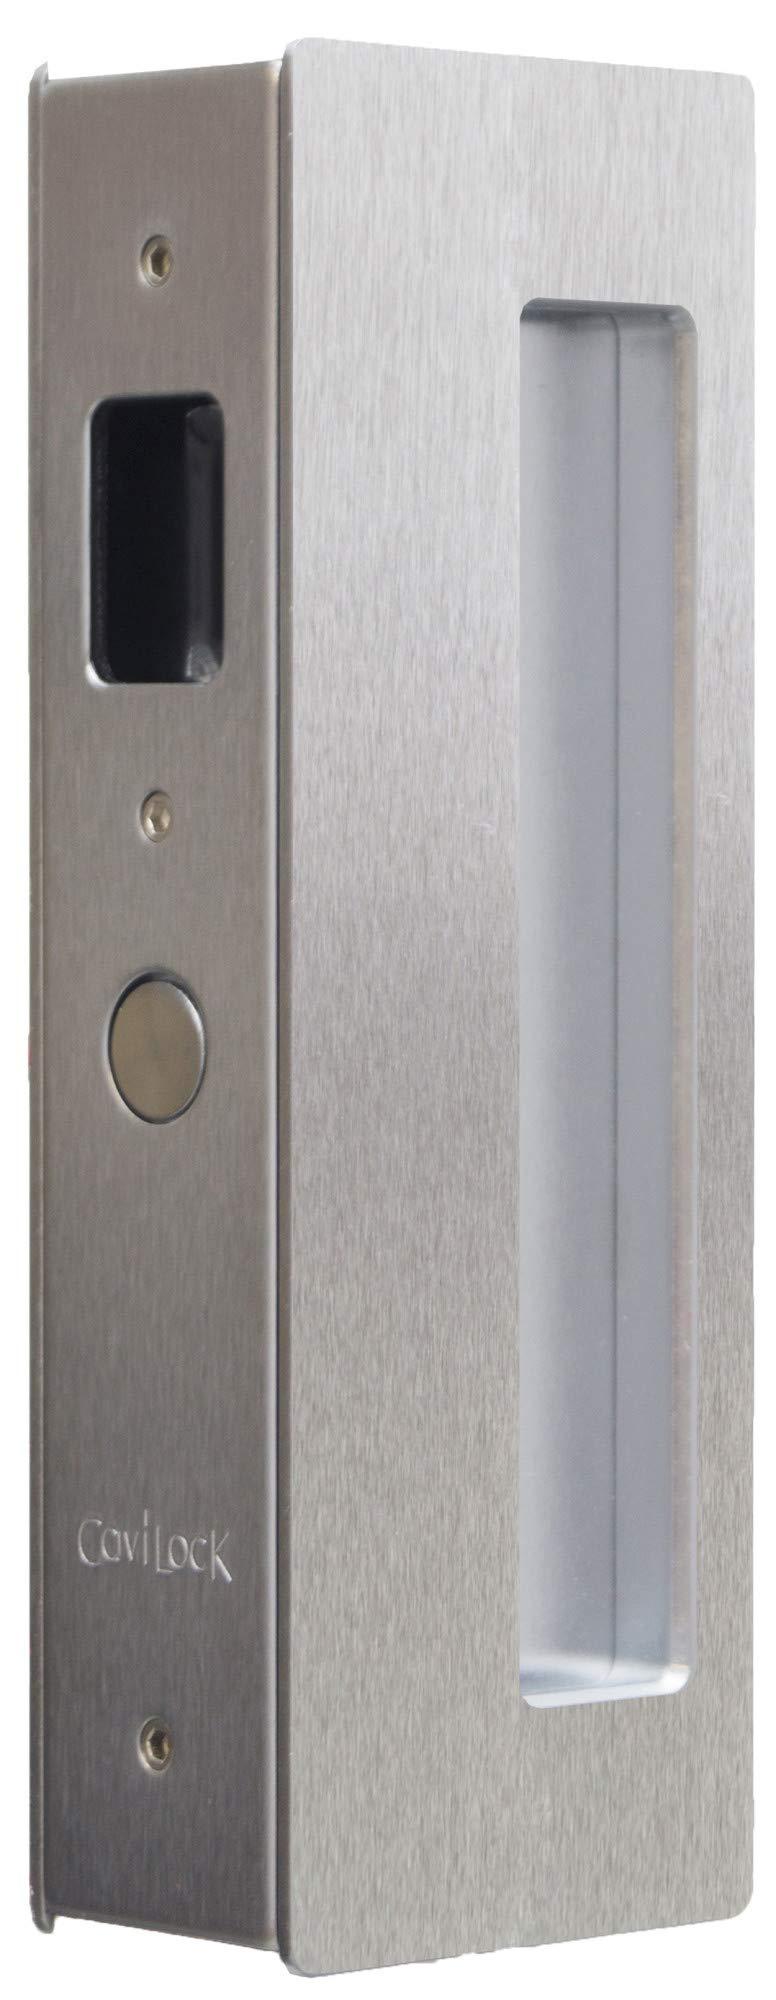 Cavilock CL400A0129 Magnetic Latching Passage Pocket Door Pull for 1-3/4 Inch Door Thickness